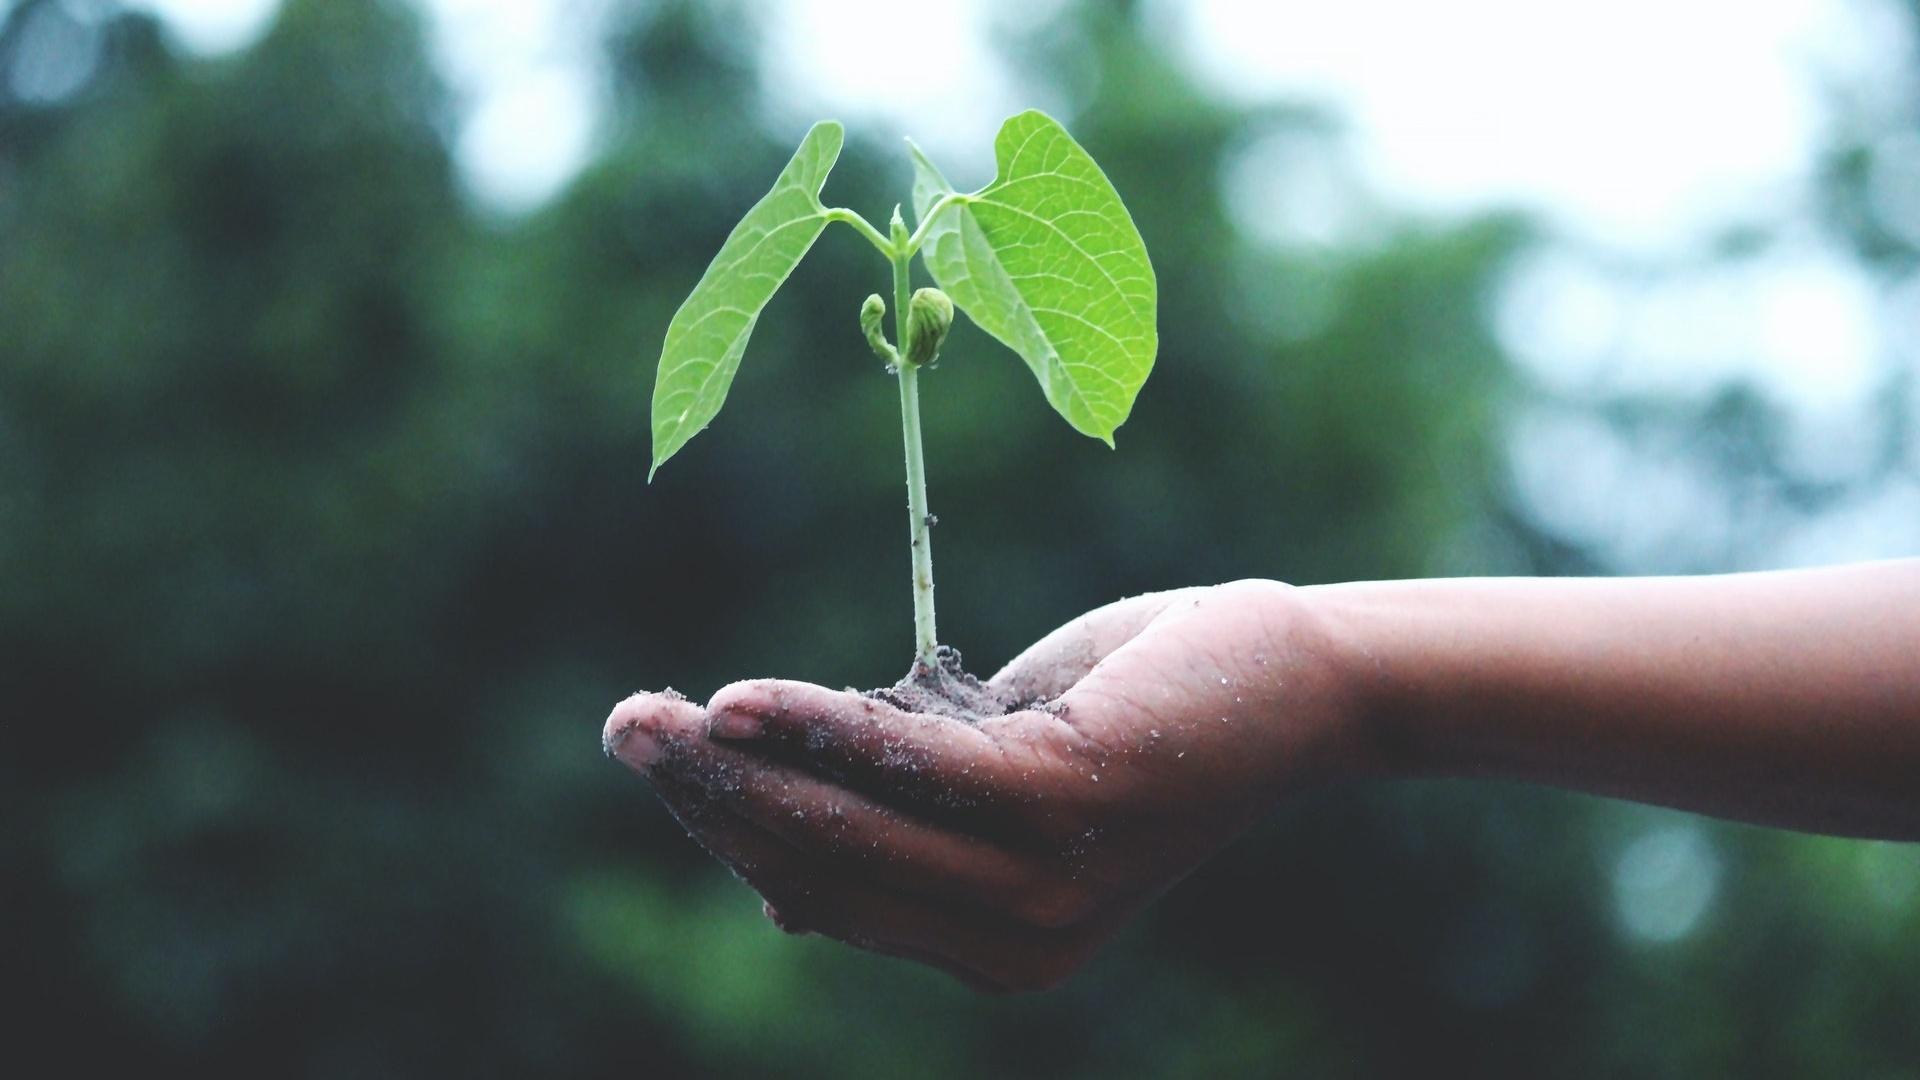 Samen stratifizieren - so geht's